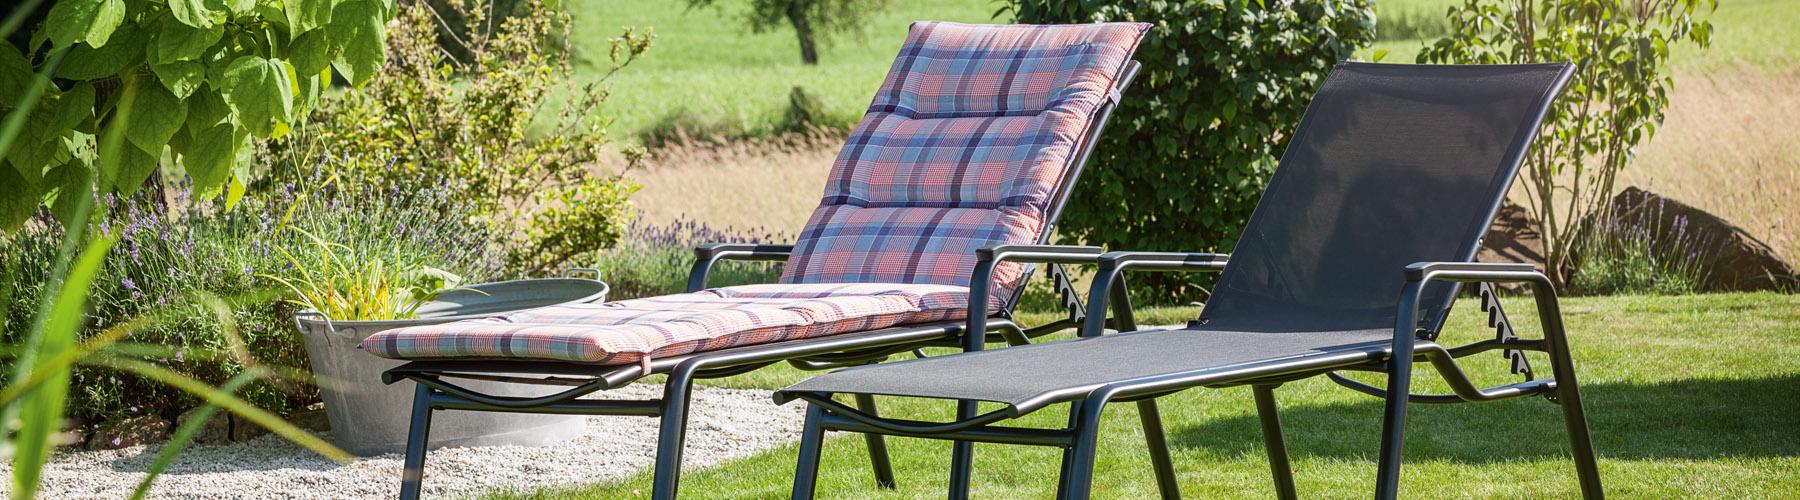 sonnenliegen g nstig online kaufen gartenm bel l nse. Black Bedroom Furniture Sets. Home Design Ideas